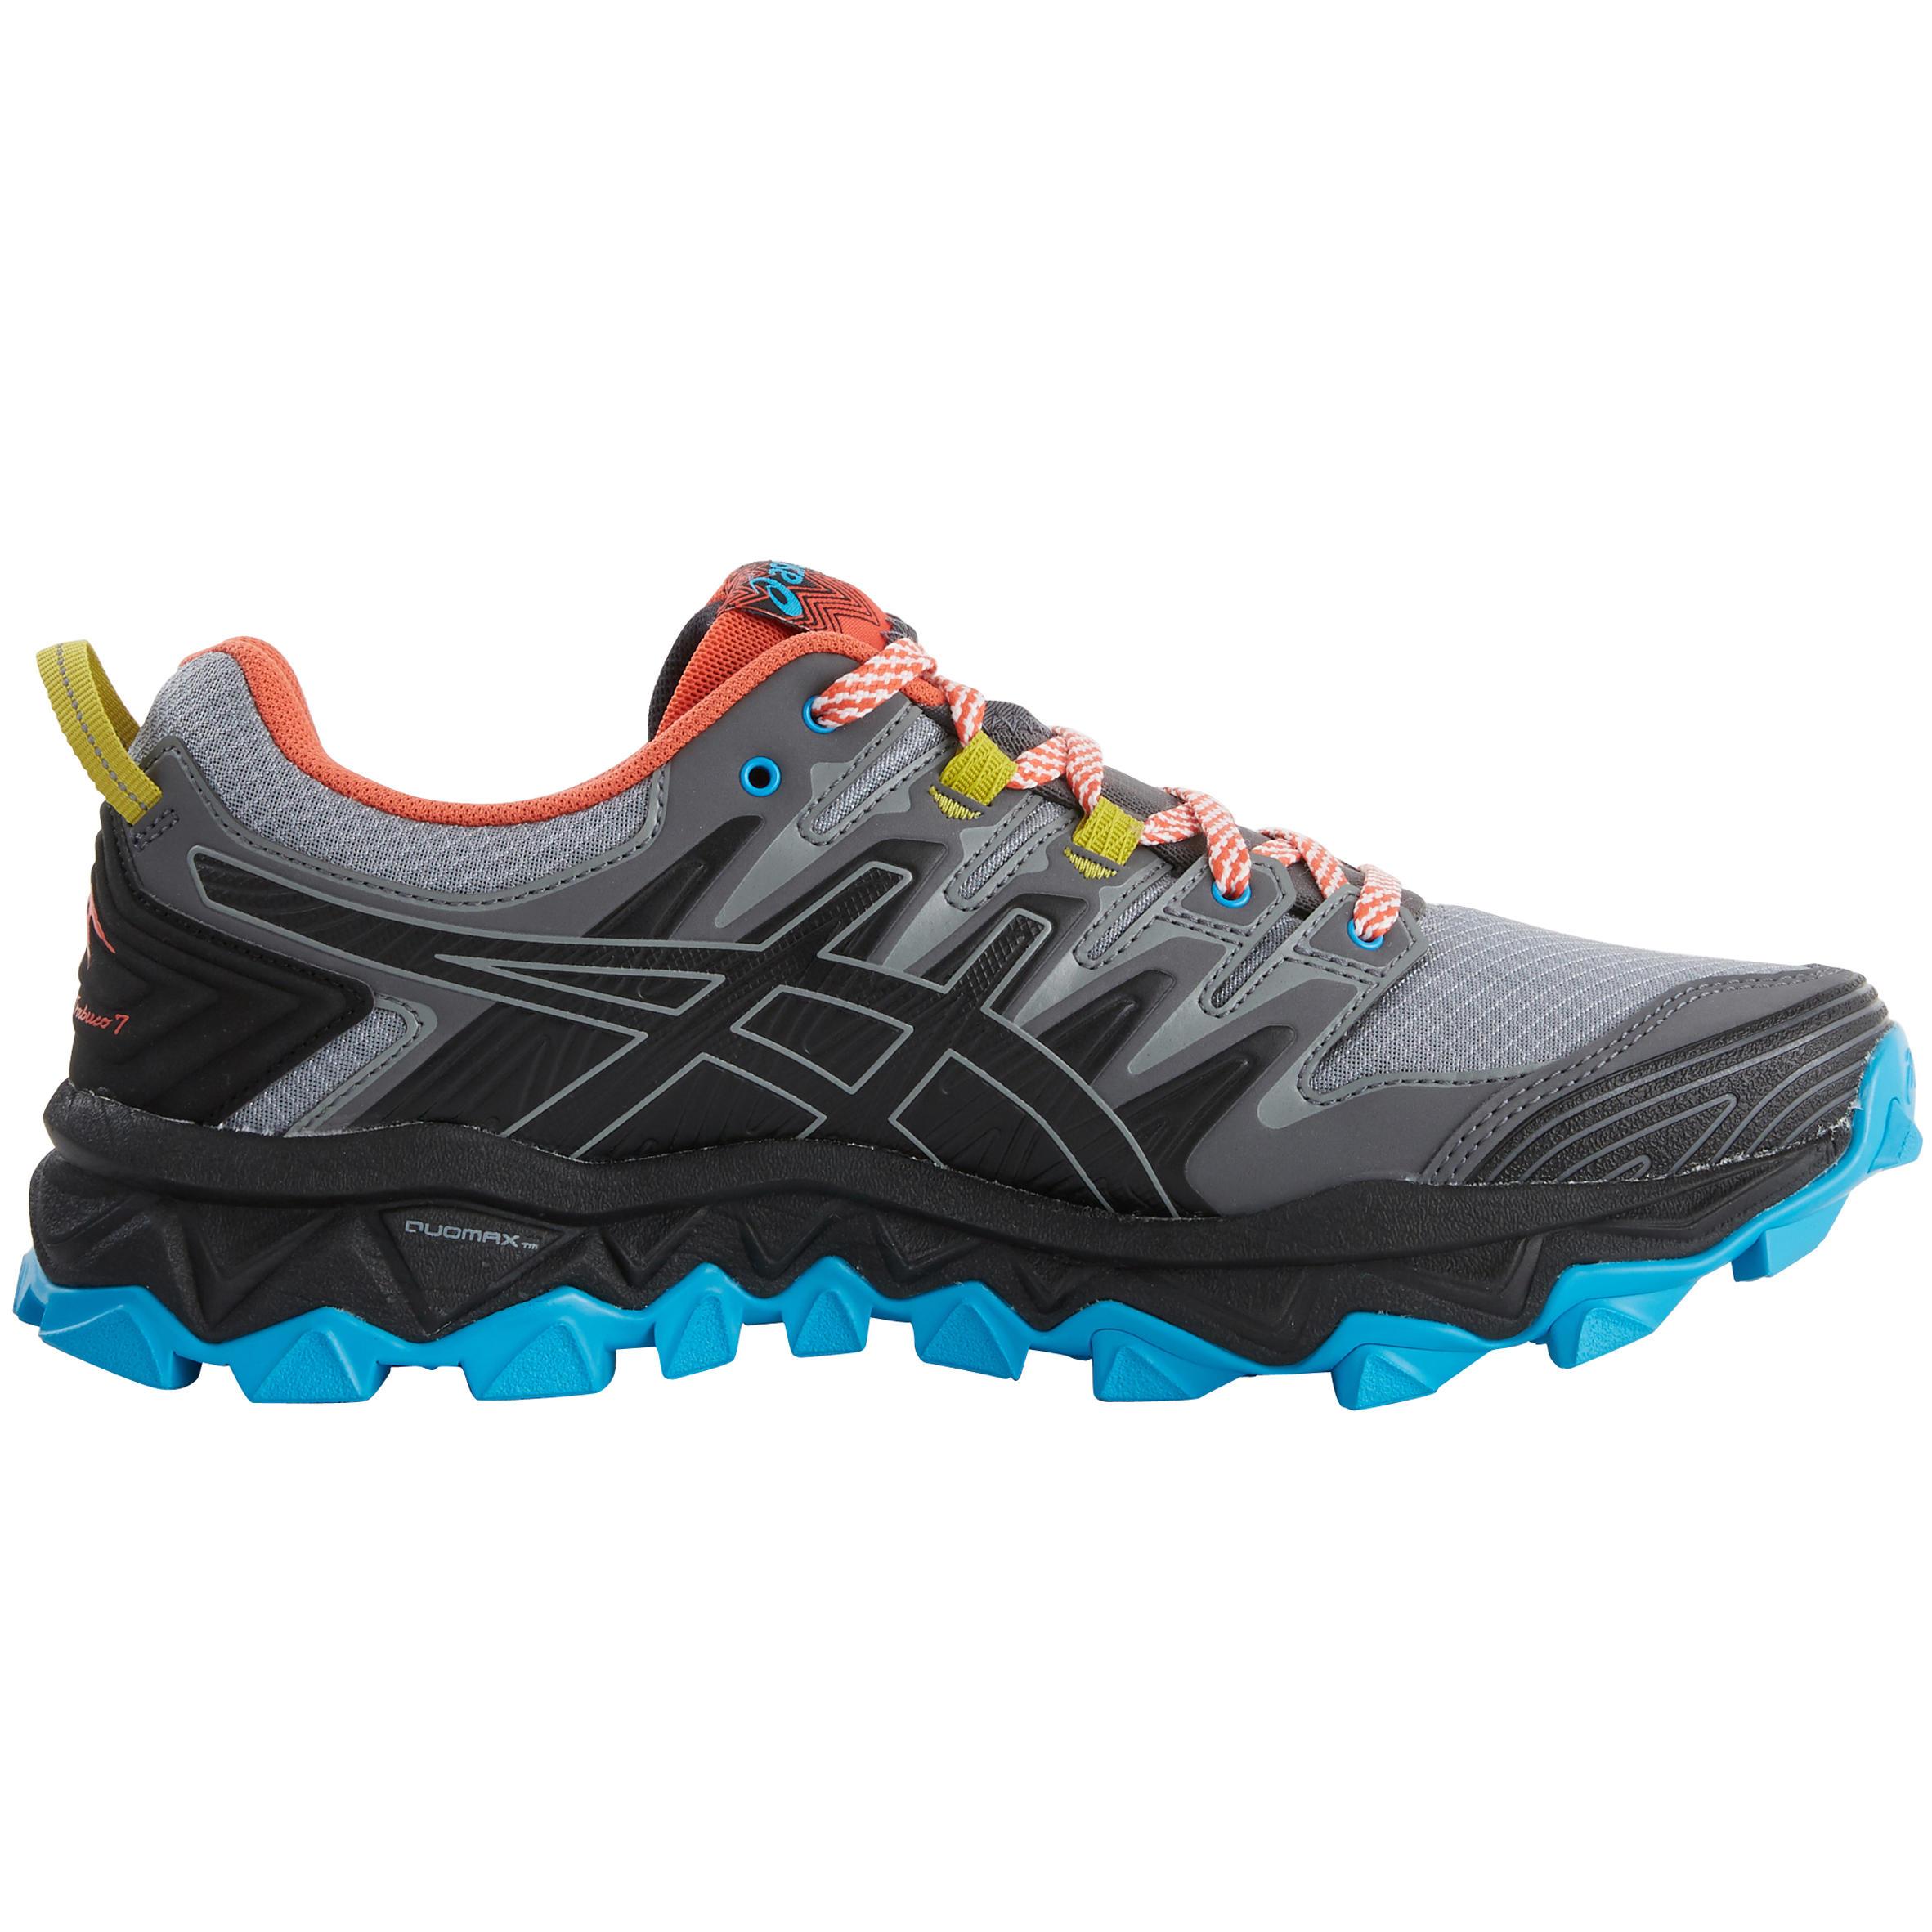 08c052b8b Comprar zapatillas de trail running